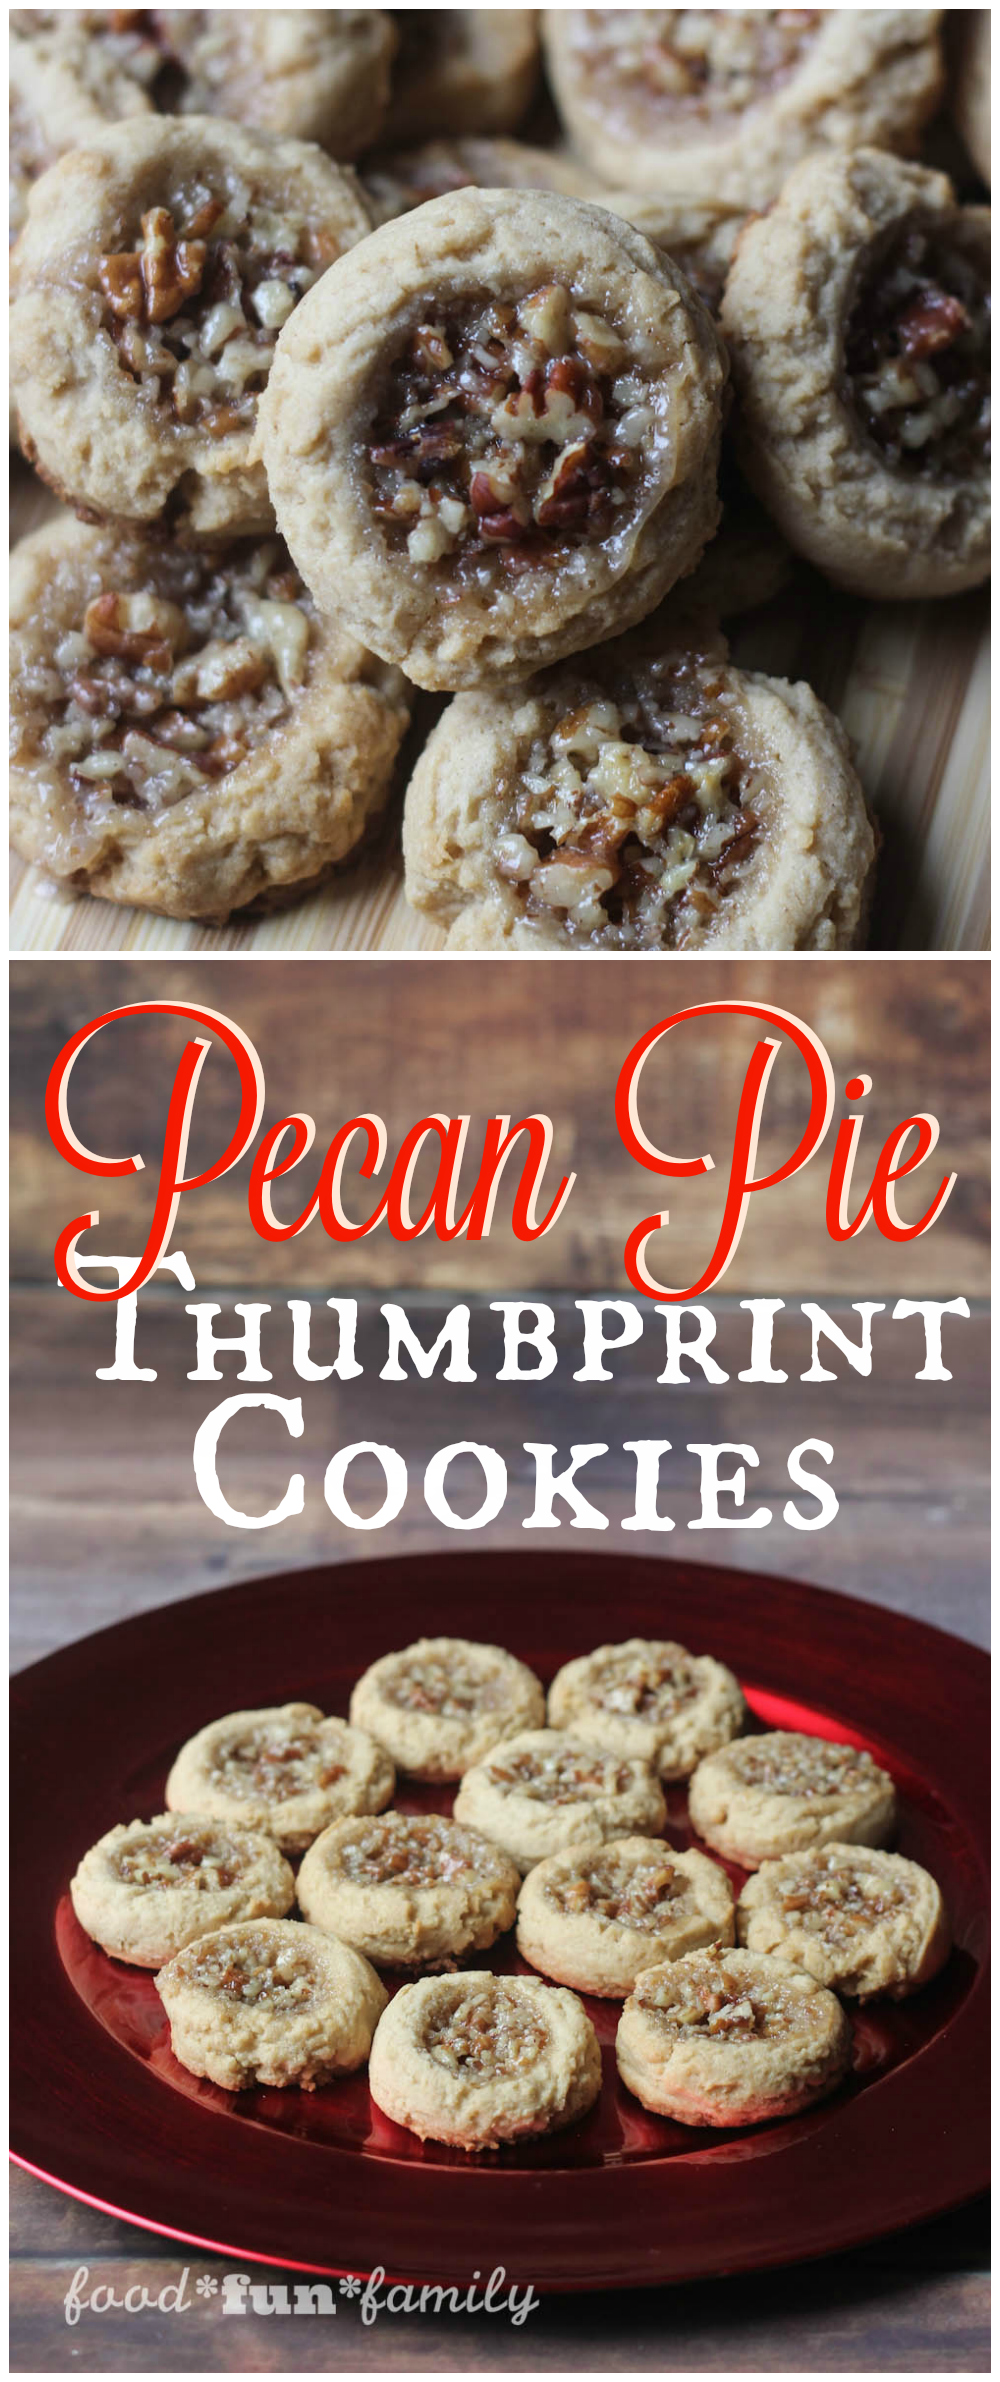 Pecan Pie Thumbprint Cookies Recipe from Food Fun Family